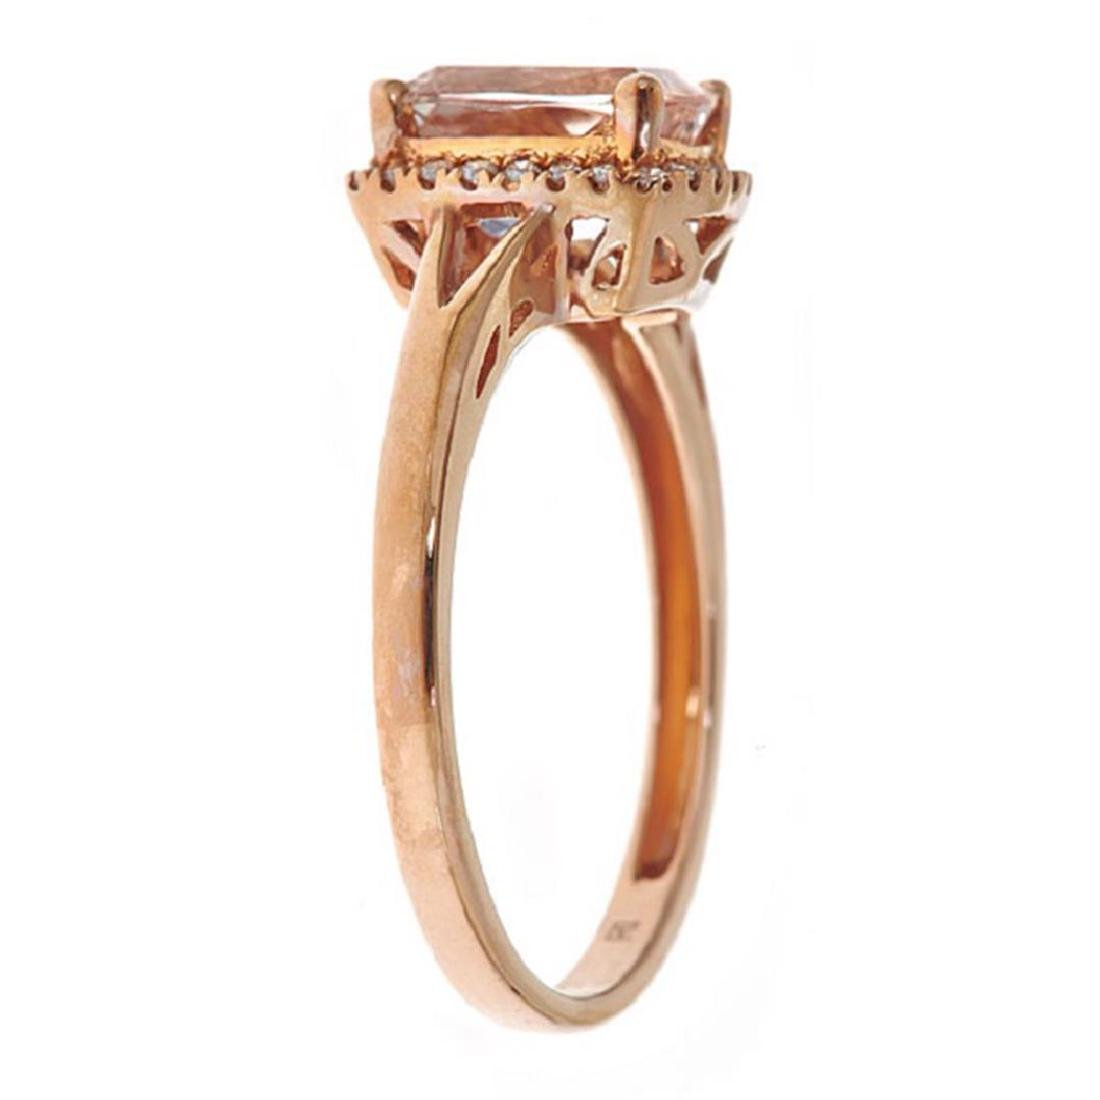 1.22 ctw Morganite and Diamond Ring - 10KT Rose Gold - 2